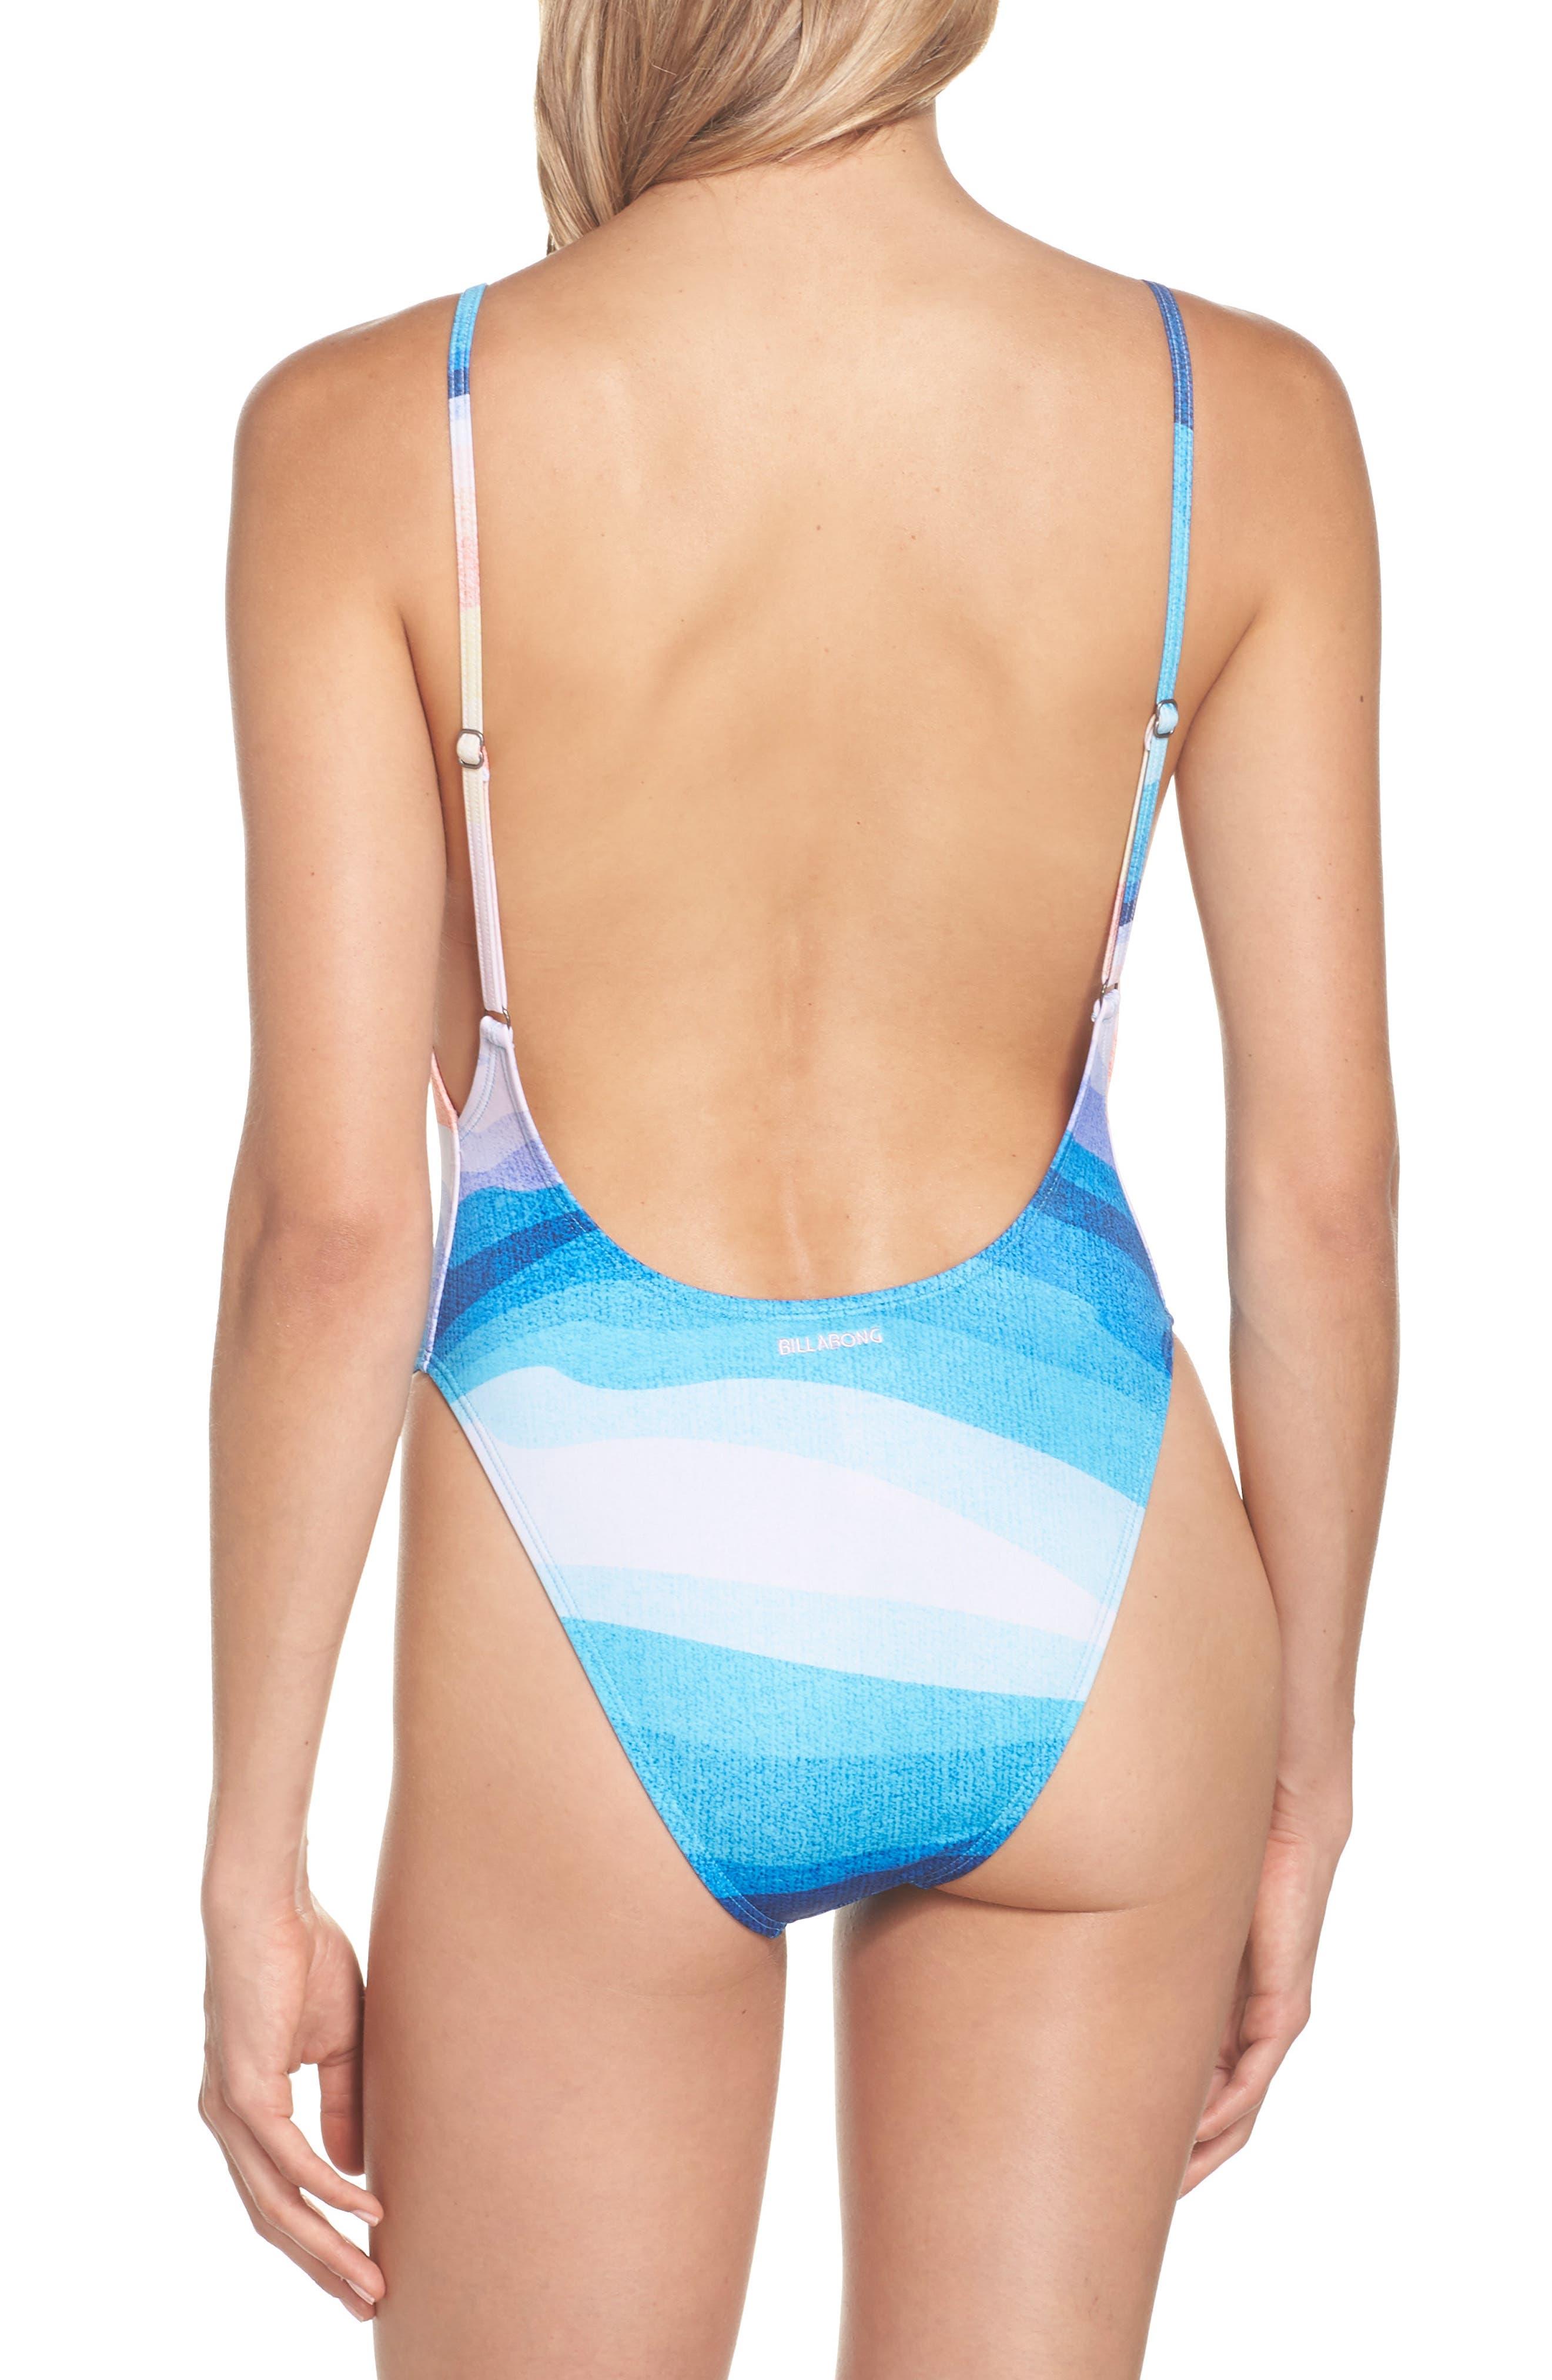 Sea Trip One-Piece Swimsuit,                             Alternate thumbnail 2, color,                             MIRAGE